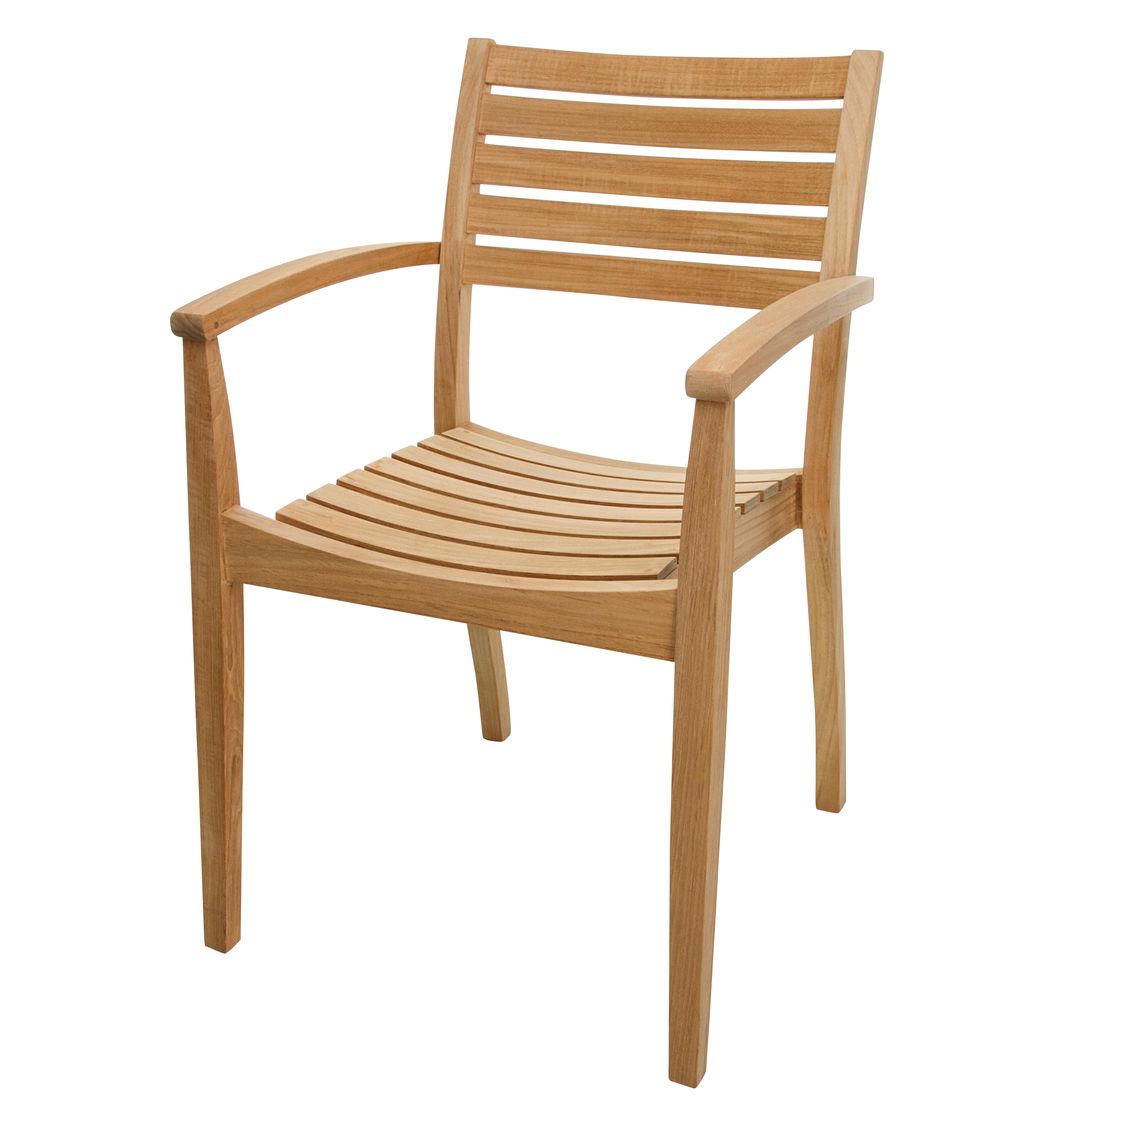 Ballare silla de jard n con reposabrazos skagerak - Sillas con reposabrazos ...